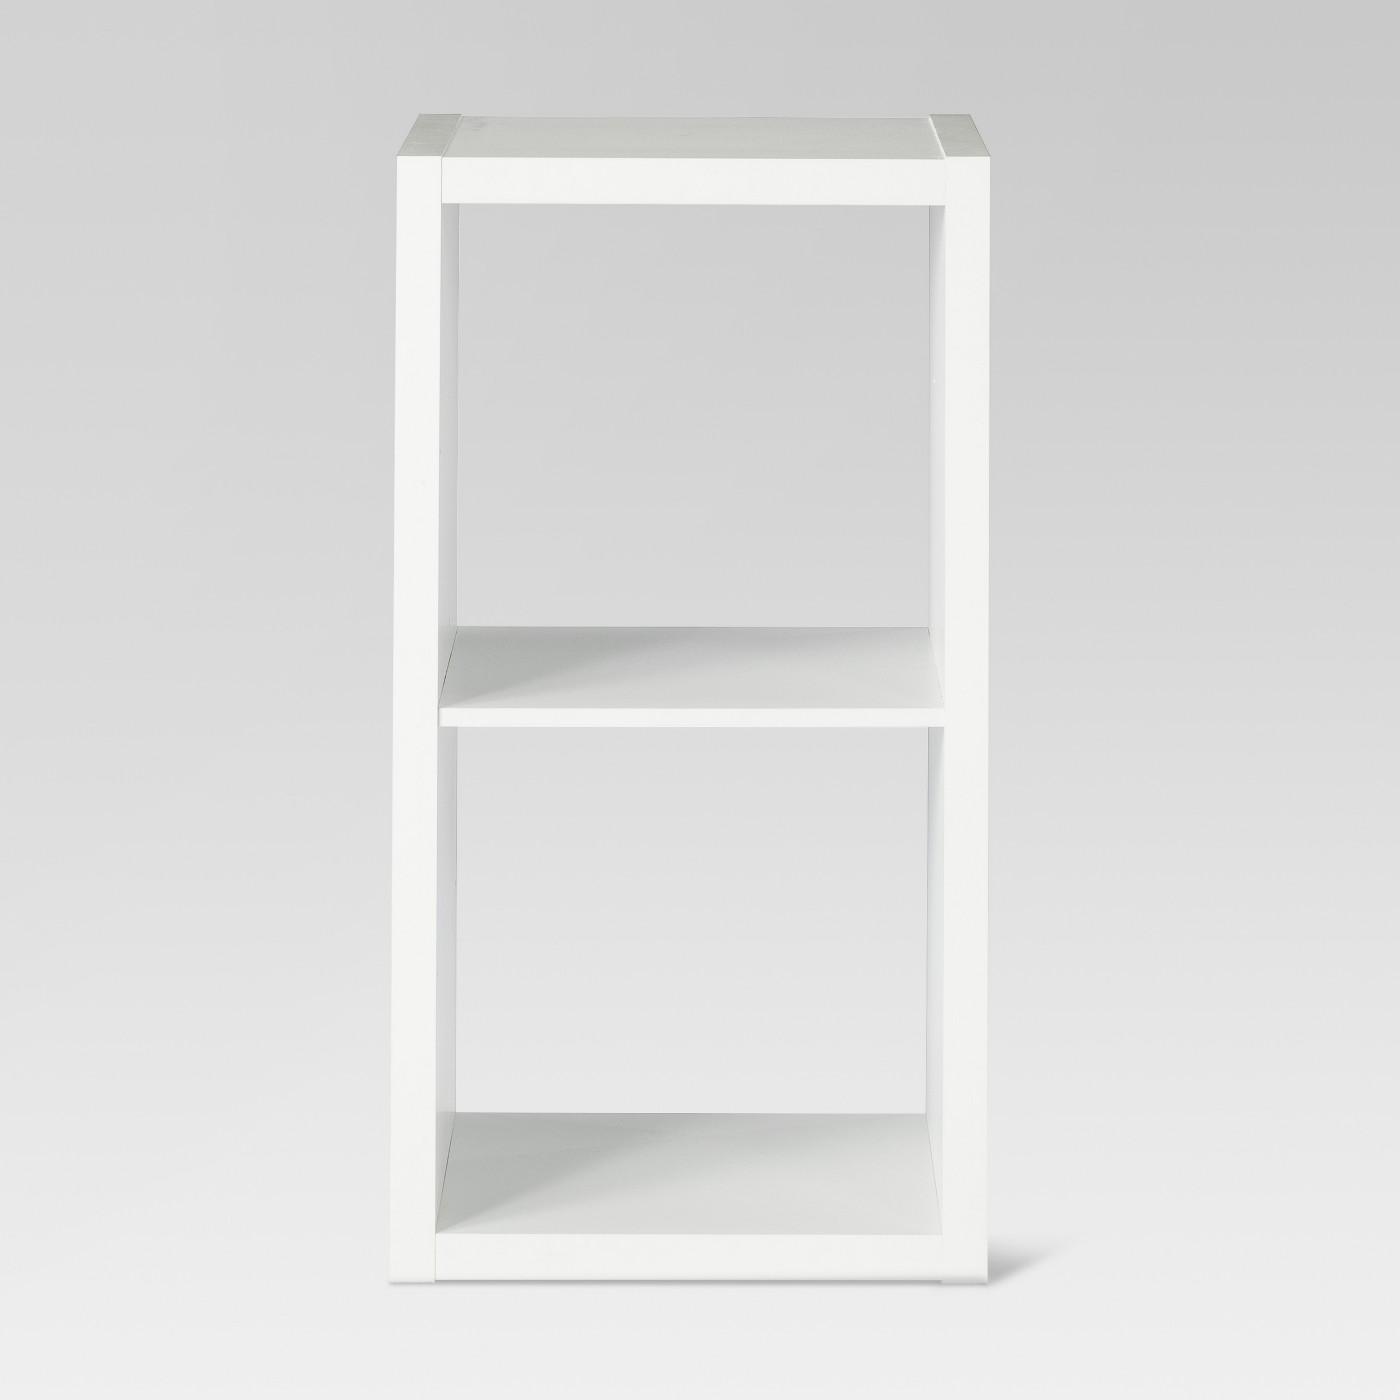 2-cube organizer shelf.jpg